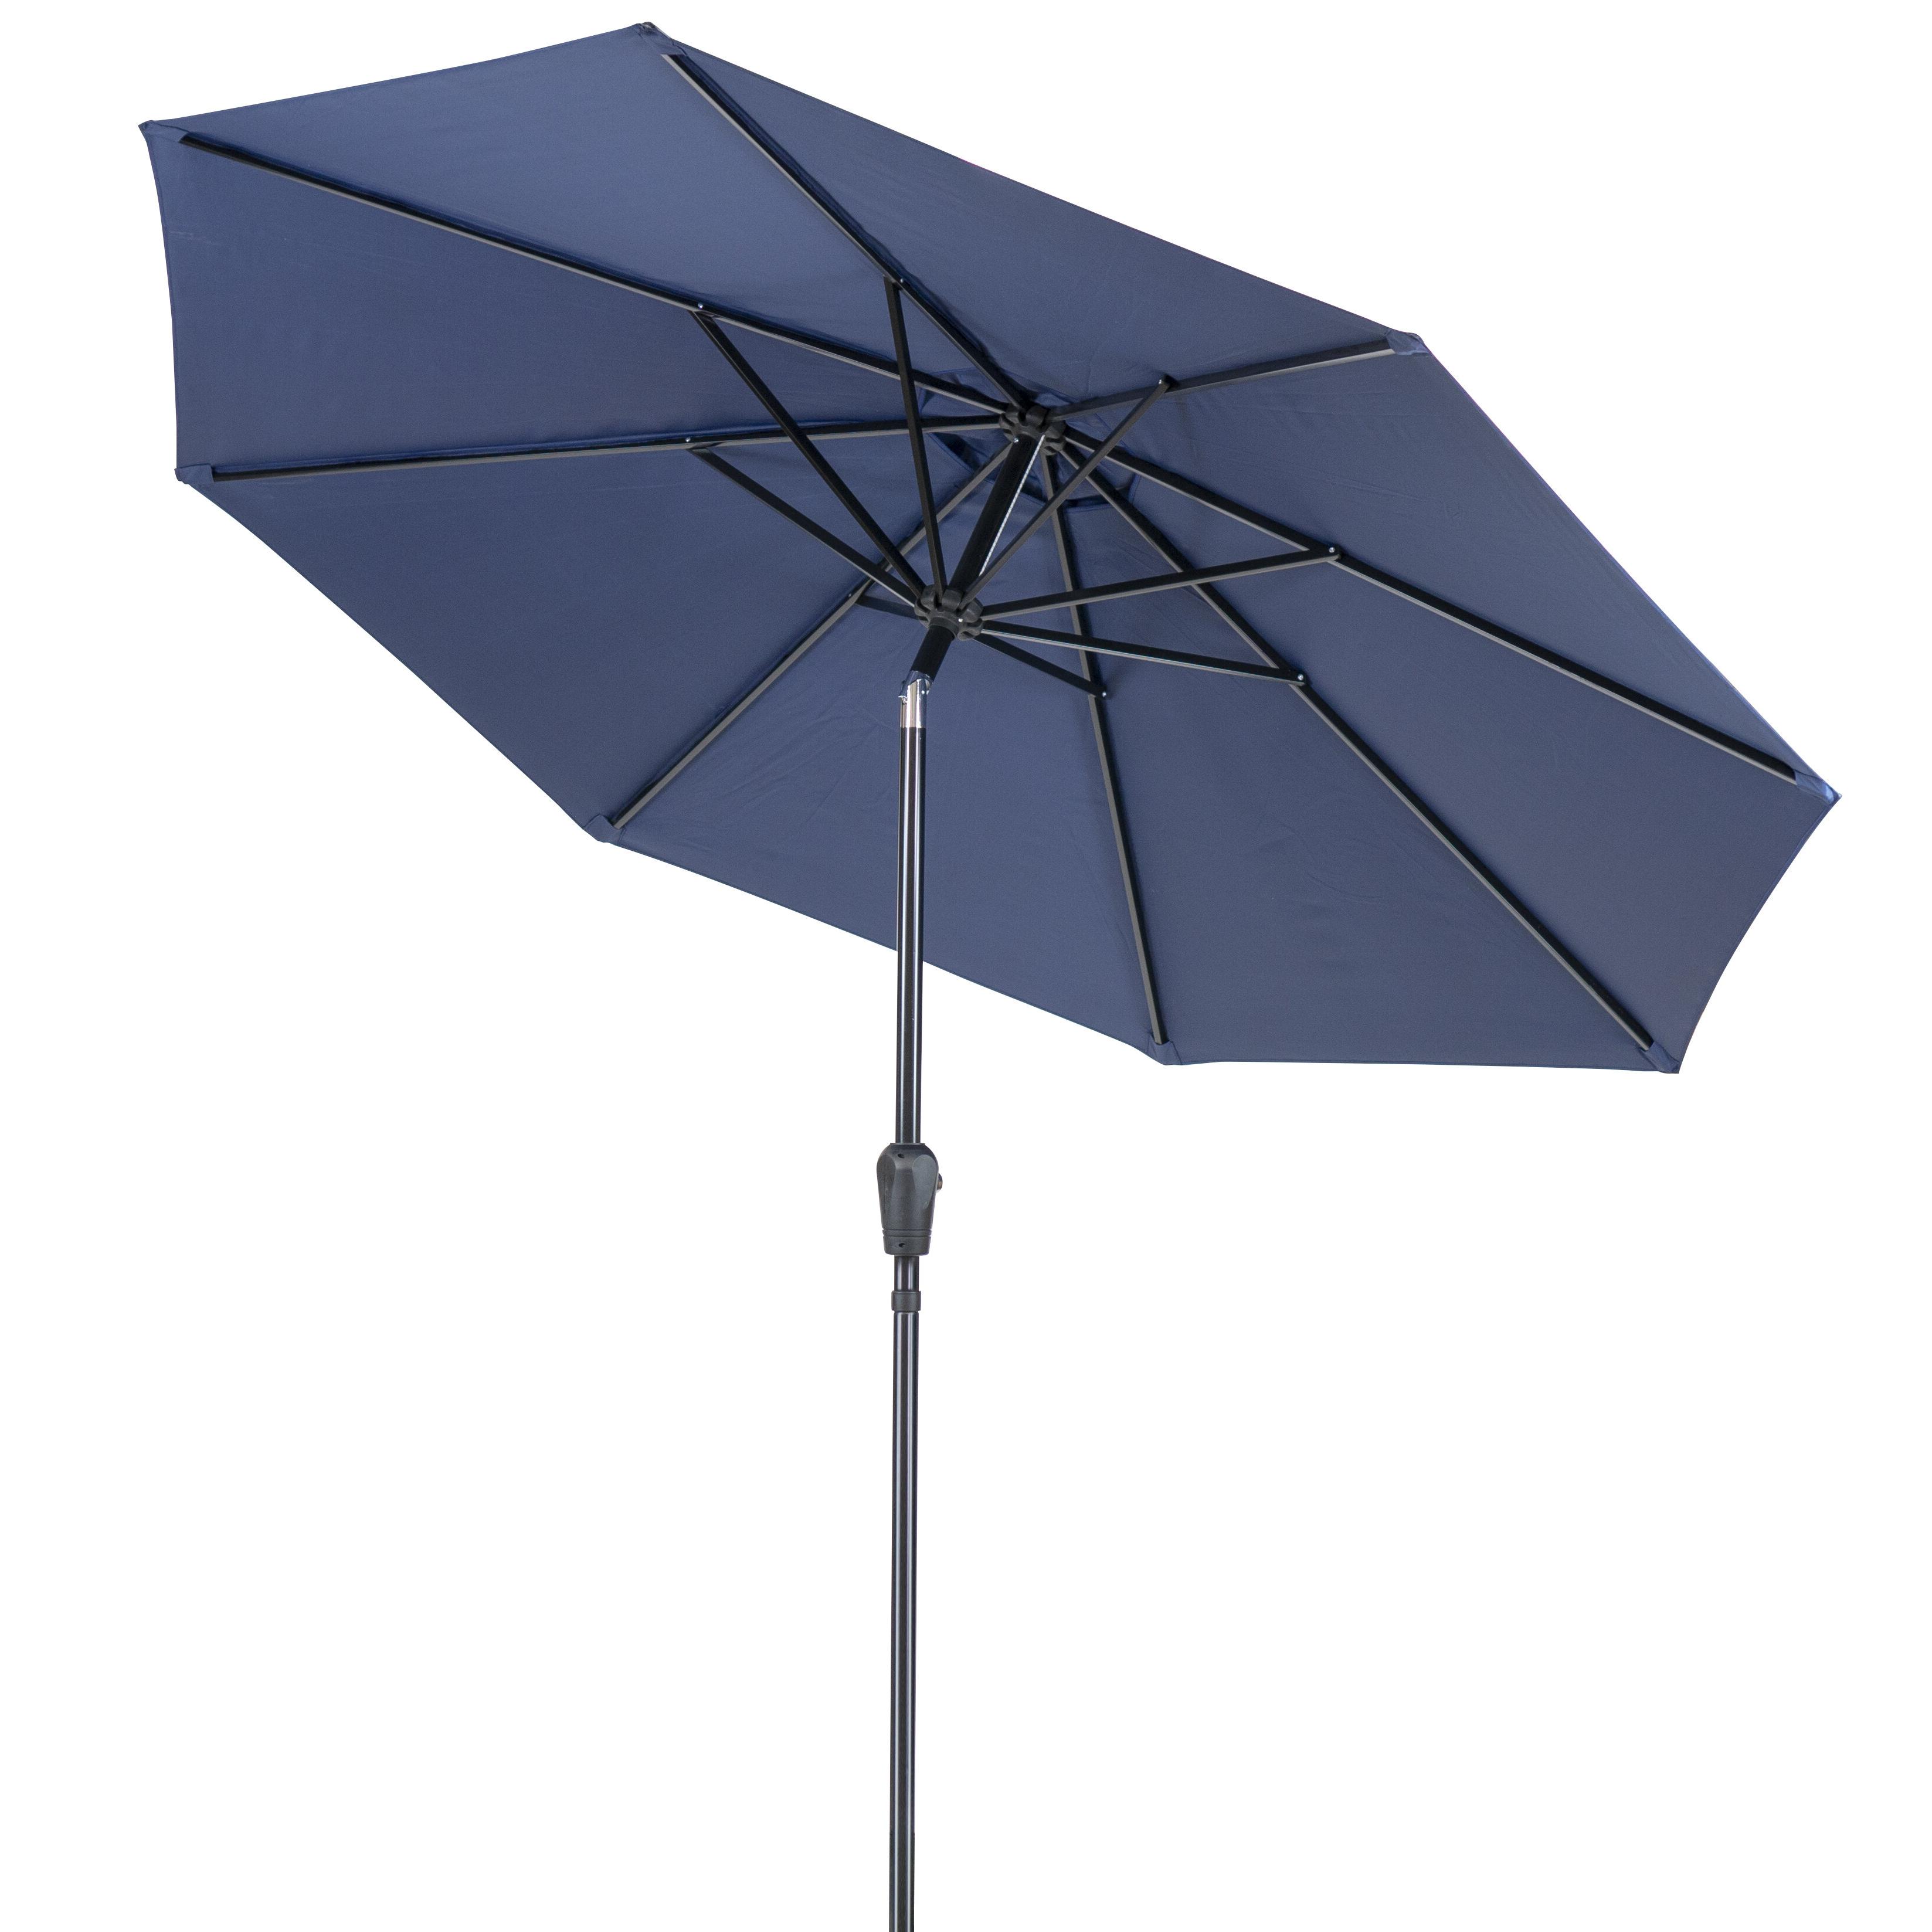 Bricelyn Market Umbrellas With Most Current Patio Premier Round 9' Market Umbrella (View 6 of 20)